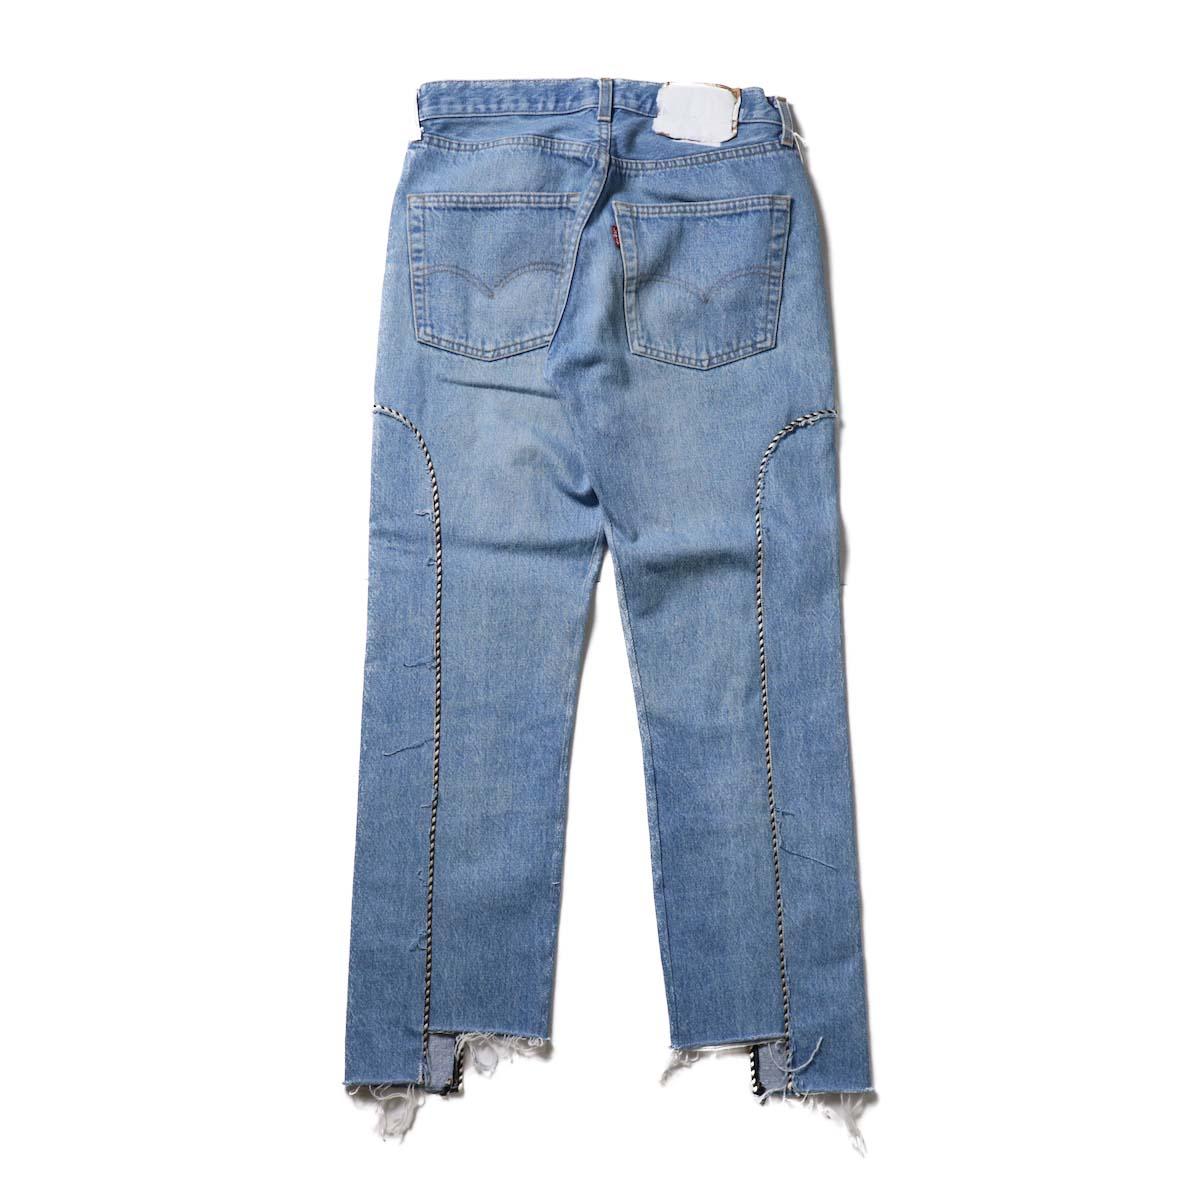 OLD PARK / Western Jeans Blue (Ssize-D)背面